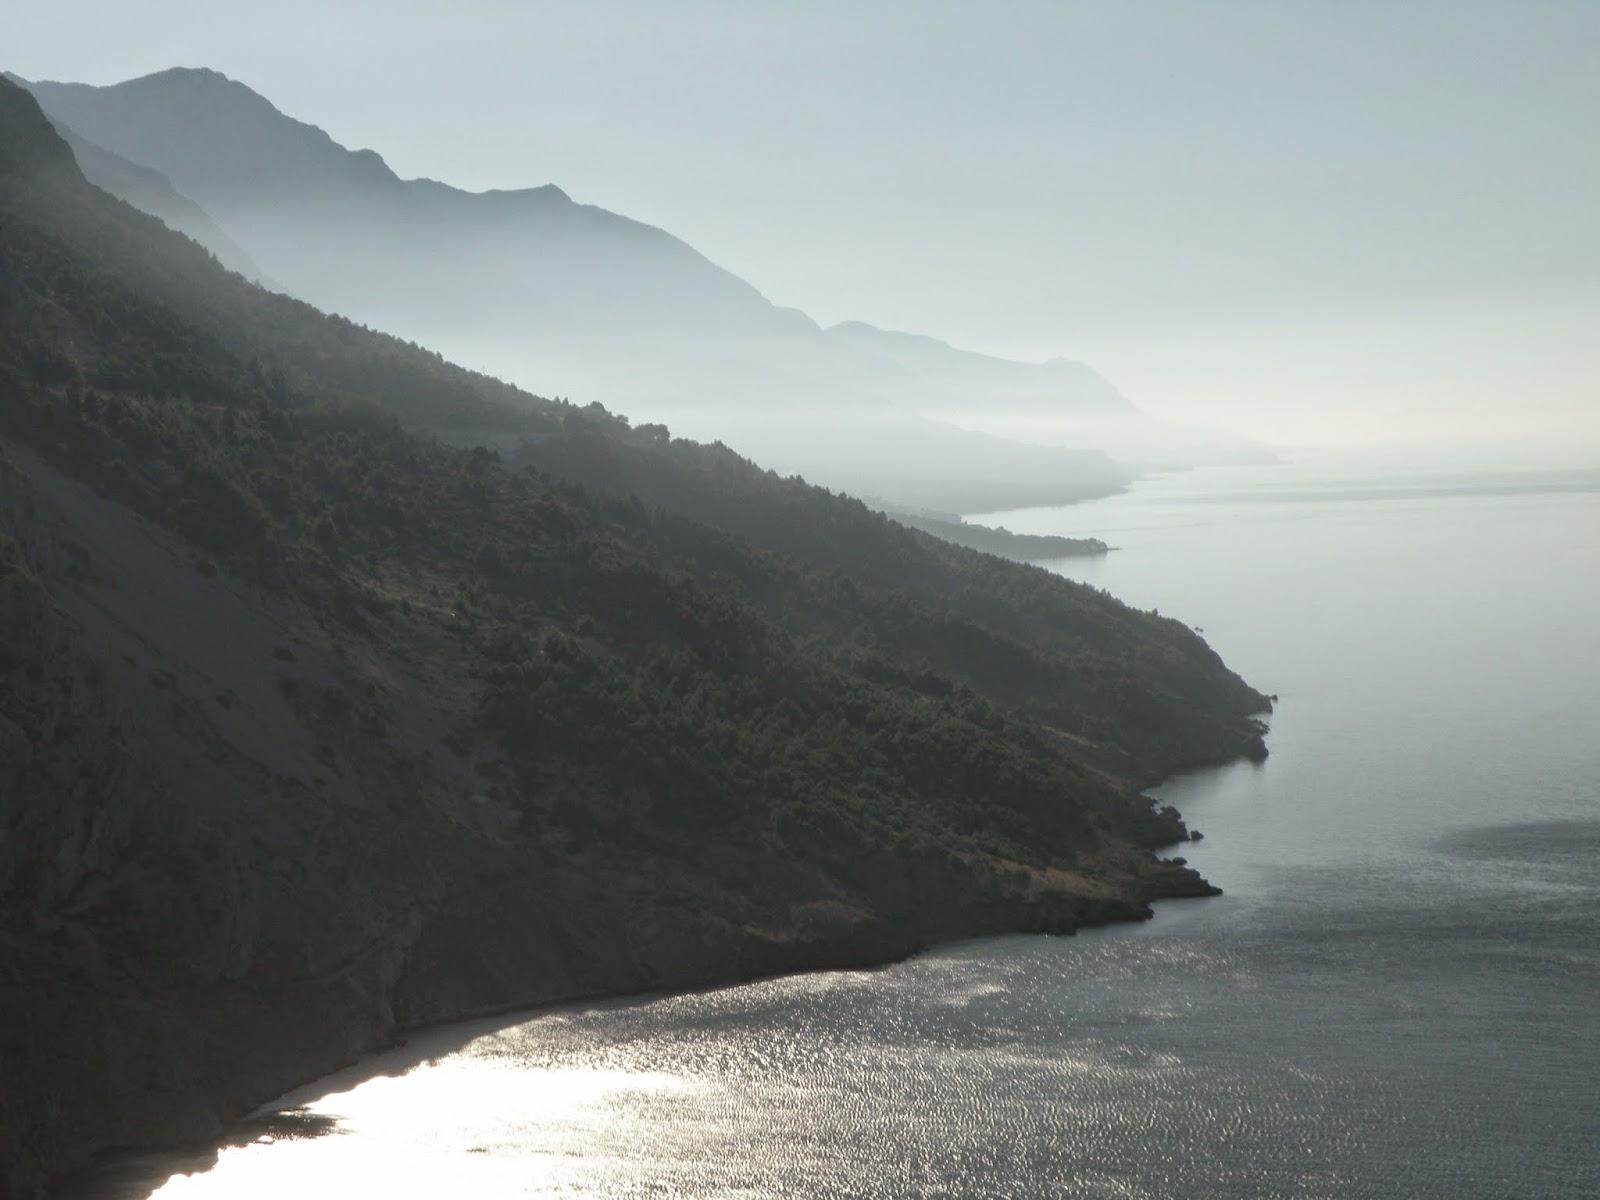 Croatia's Adriatic Highway. Photograph by Janie Robinson, Travel Writer